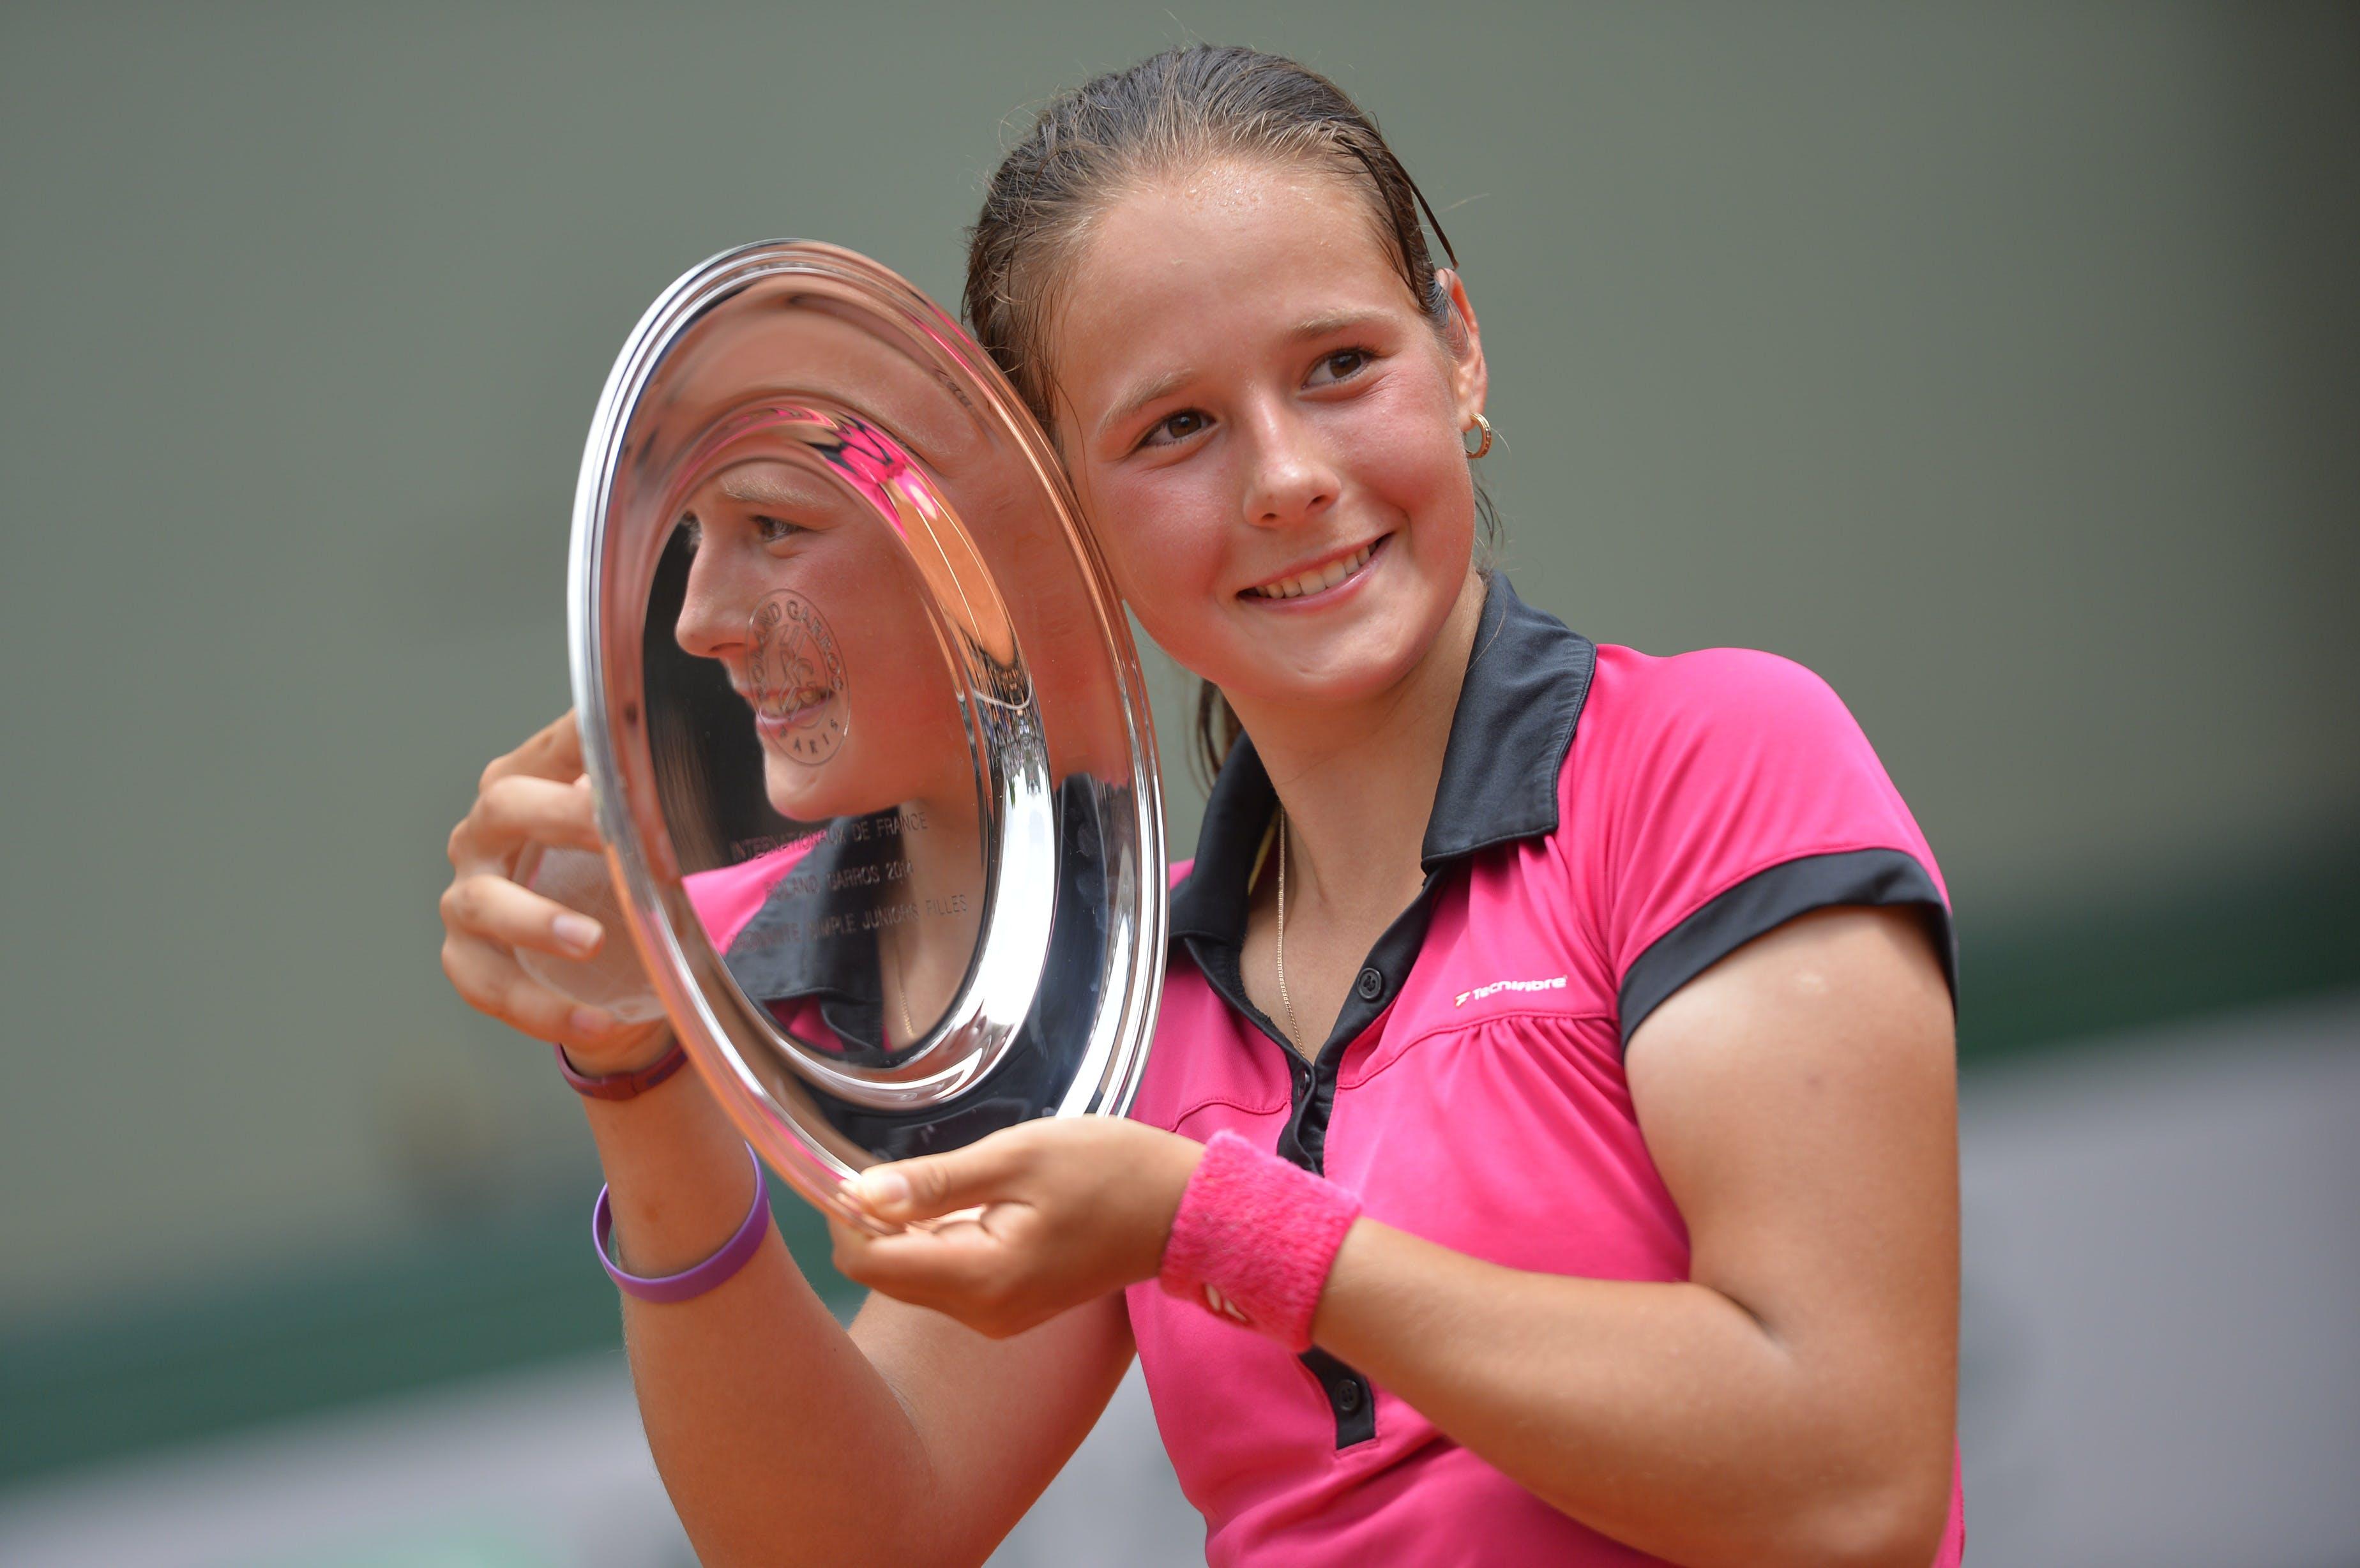 Daria Kasatkina Roland-Garros girls singles champion / championne simple juniors filles 2014.